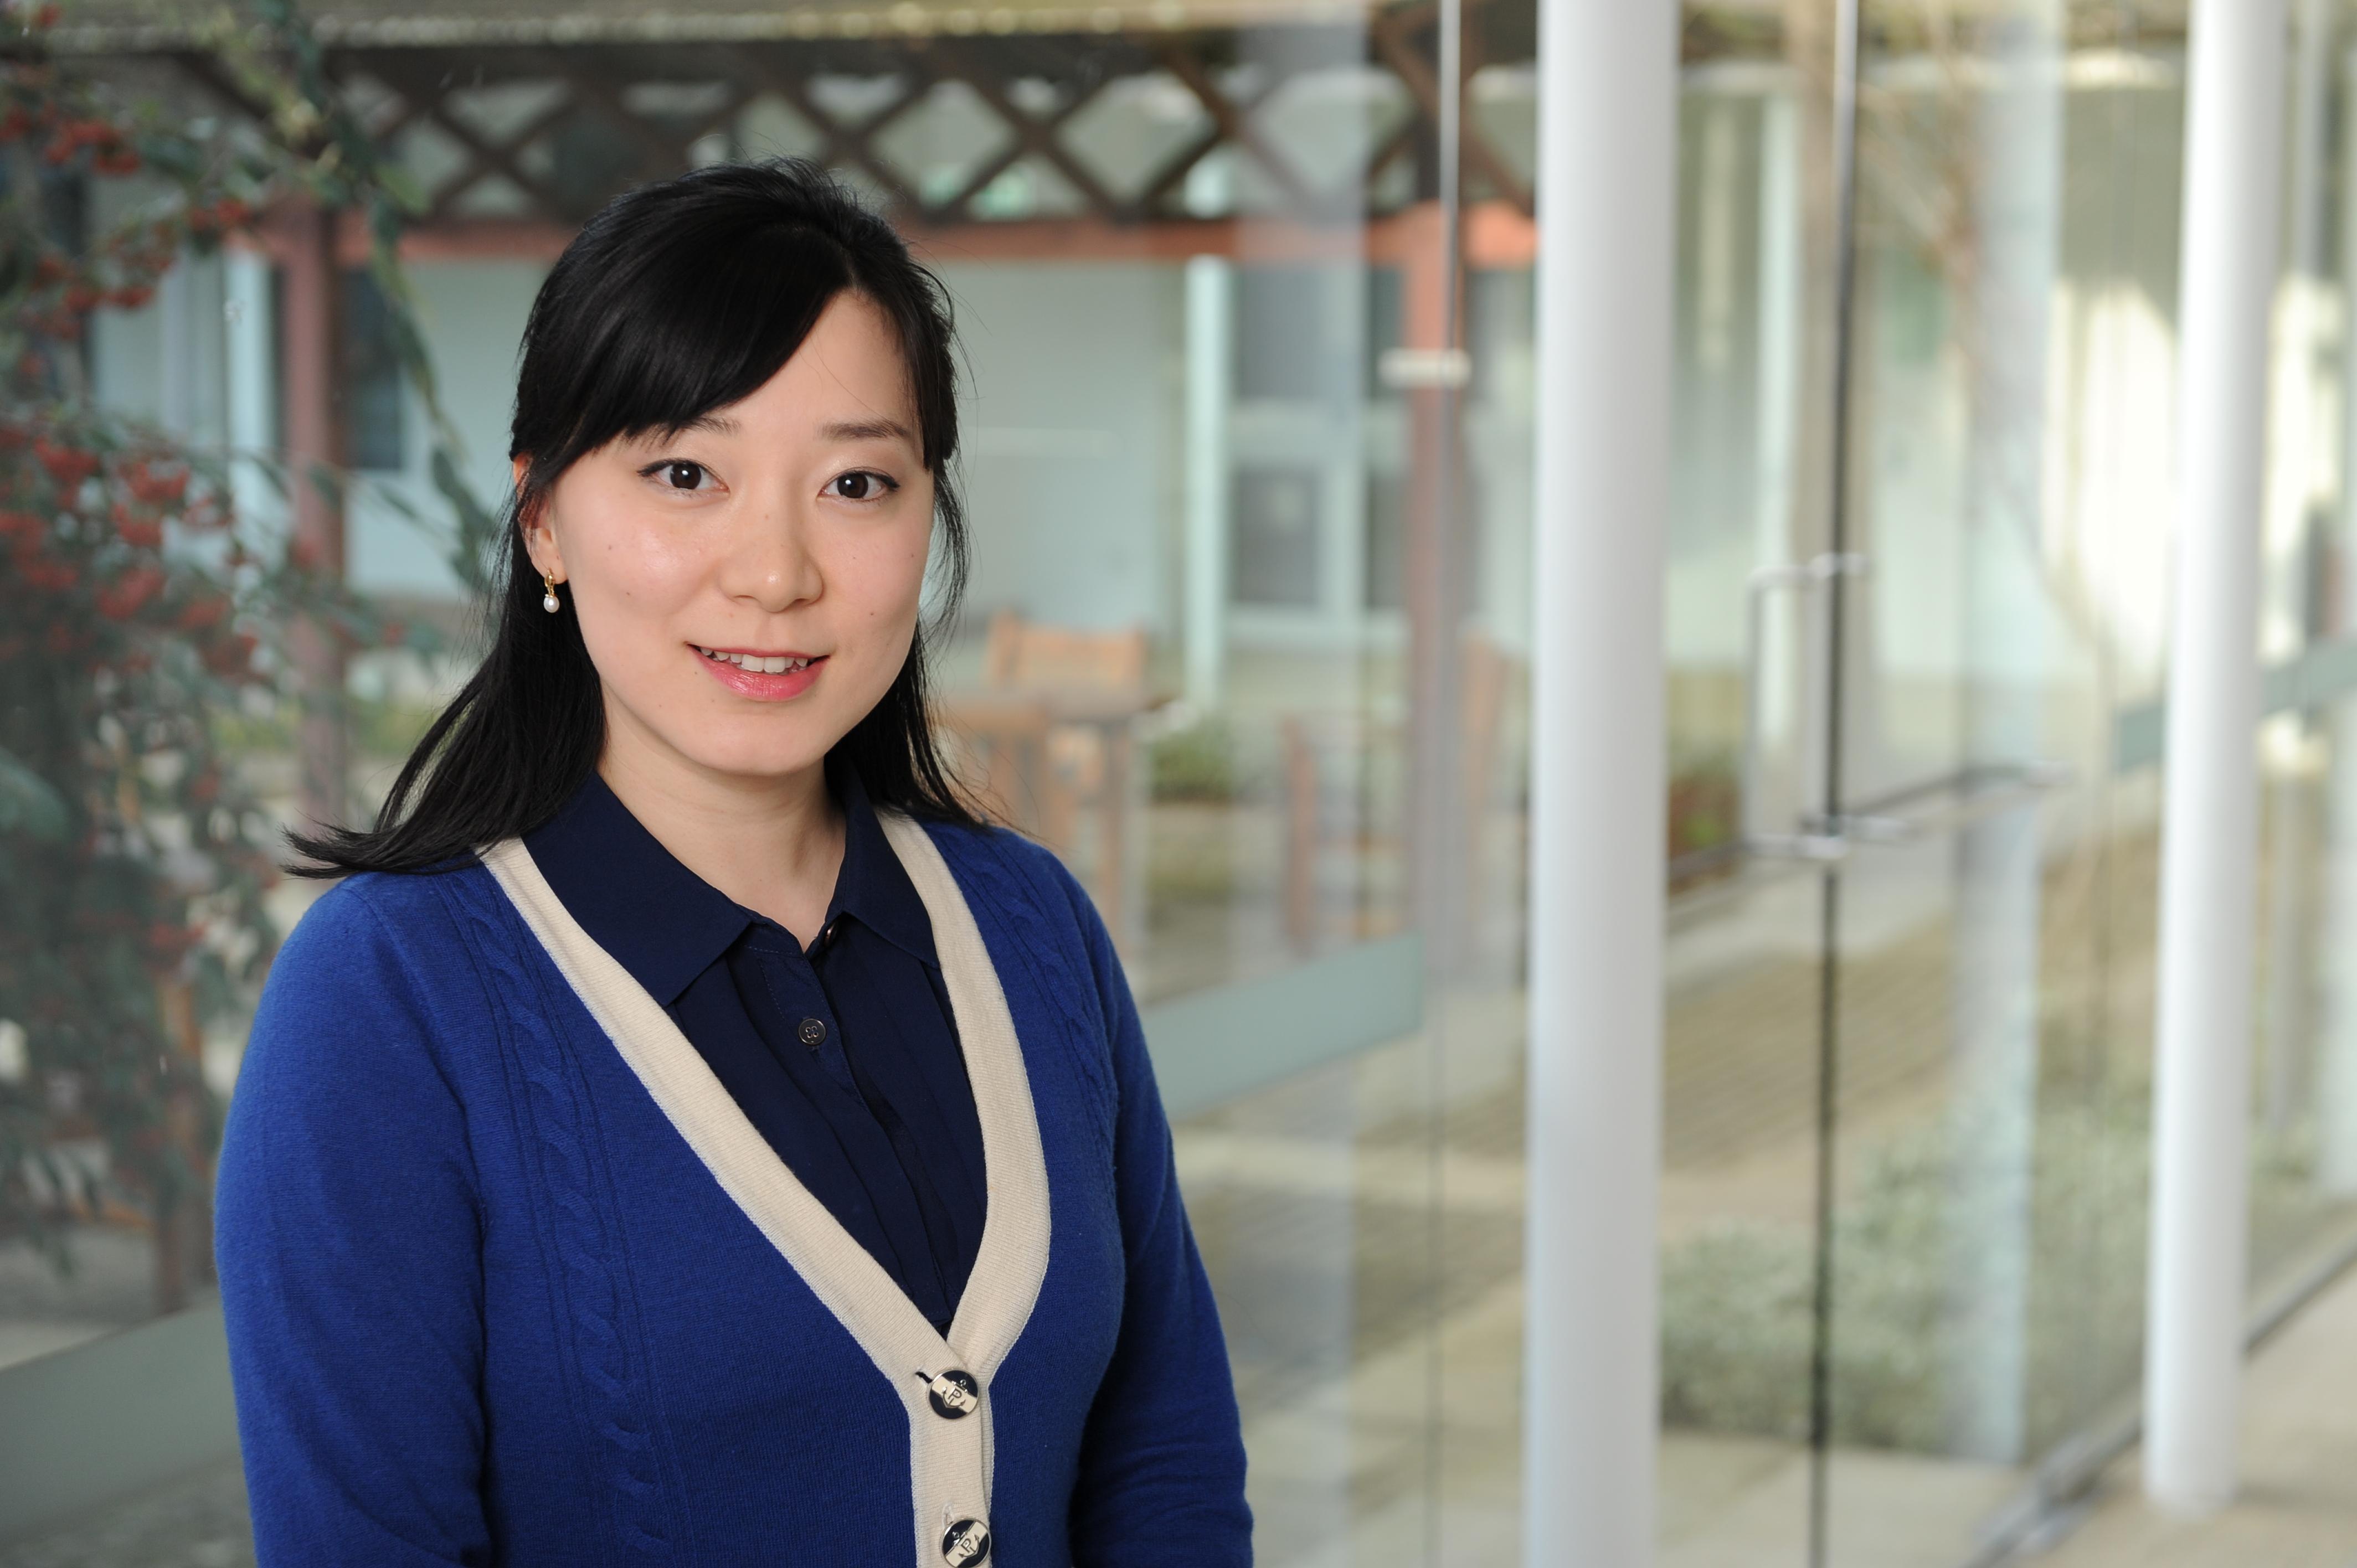 Cindy_Zhang3.JPG